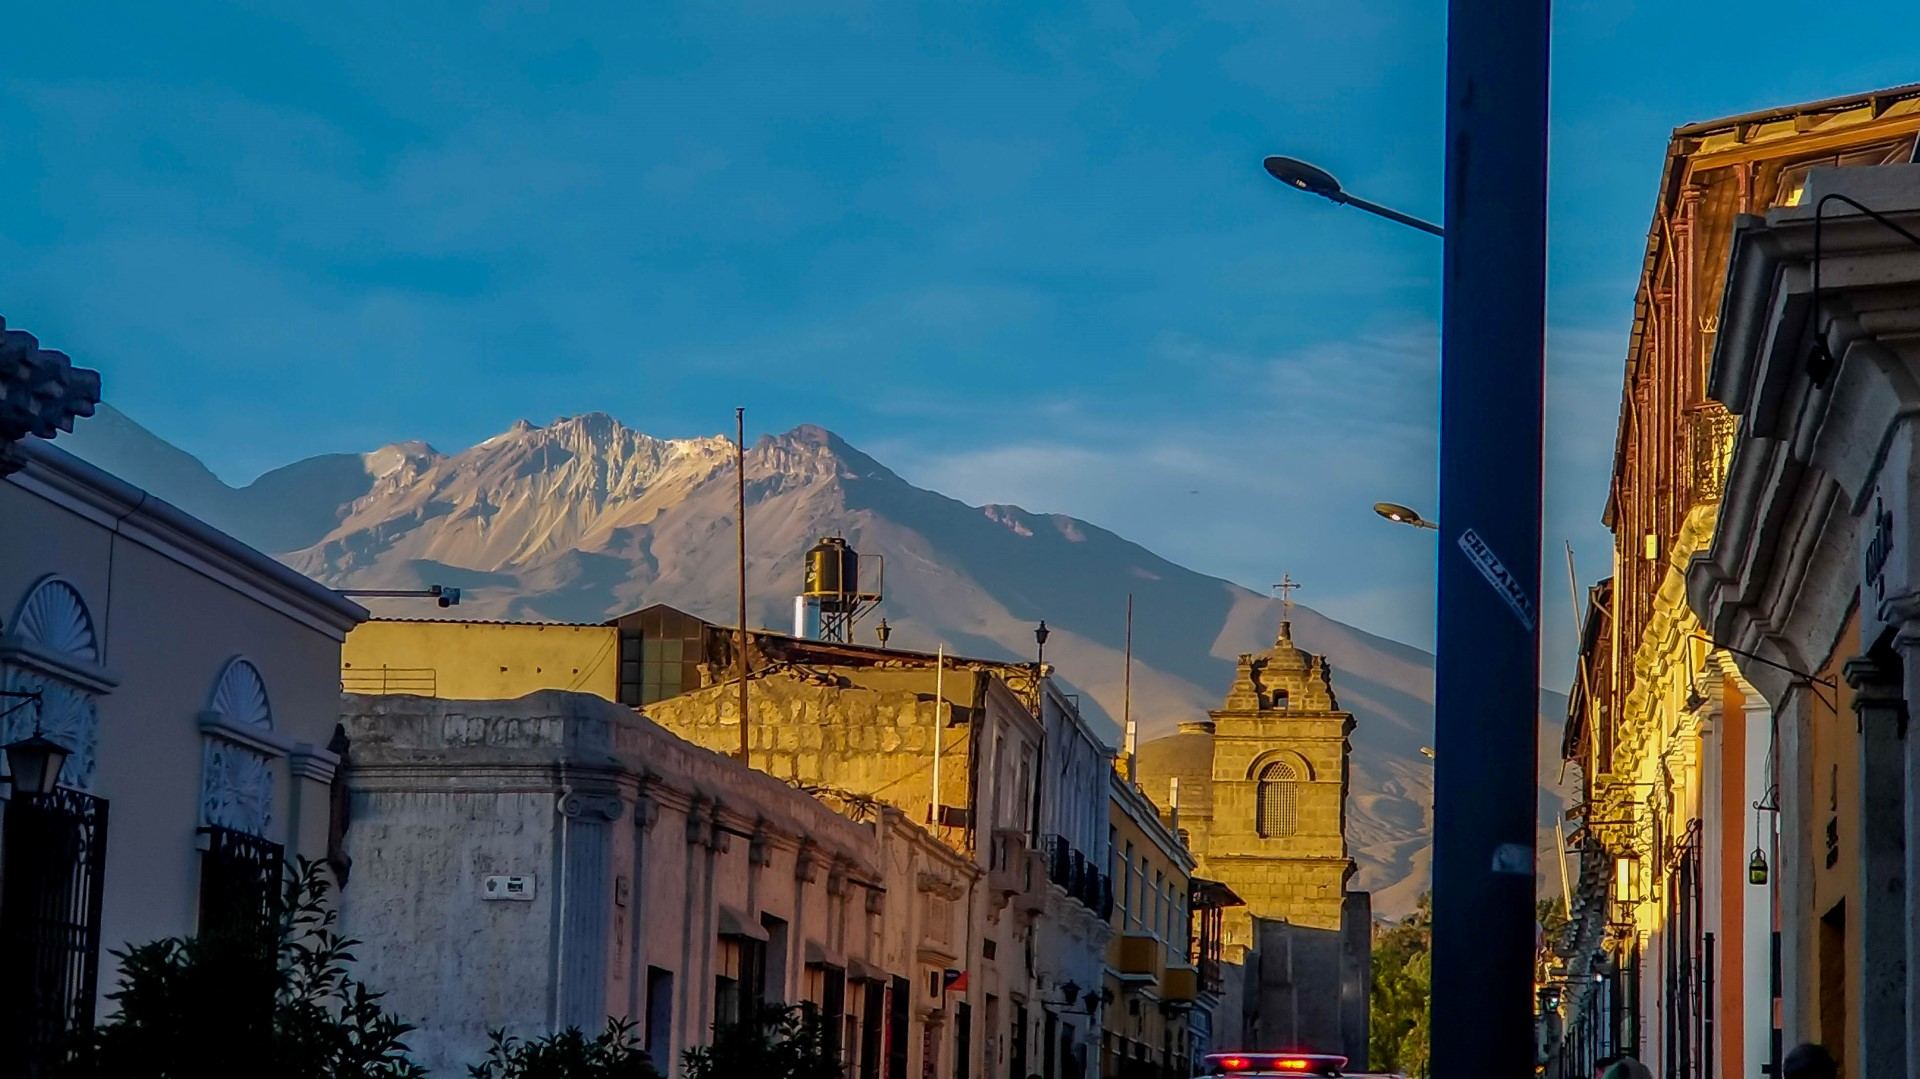 Arequipa,Peru on the Gringo Trail